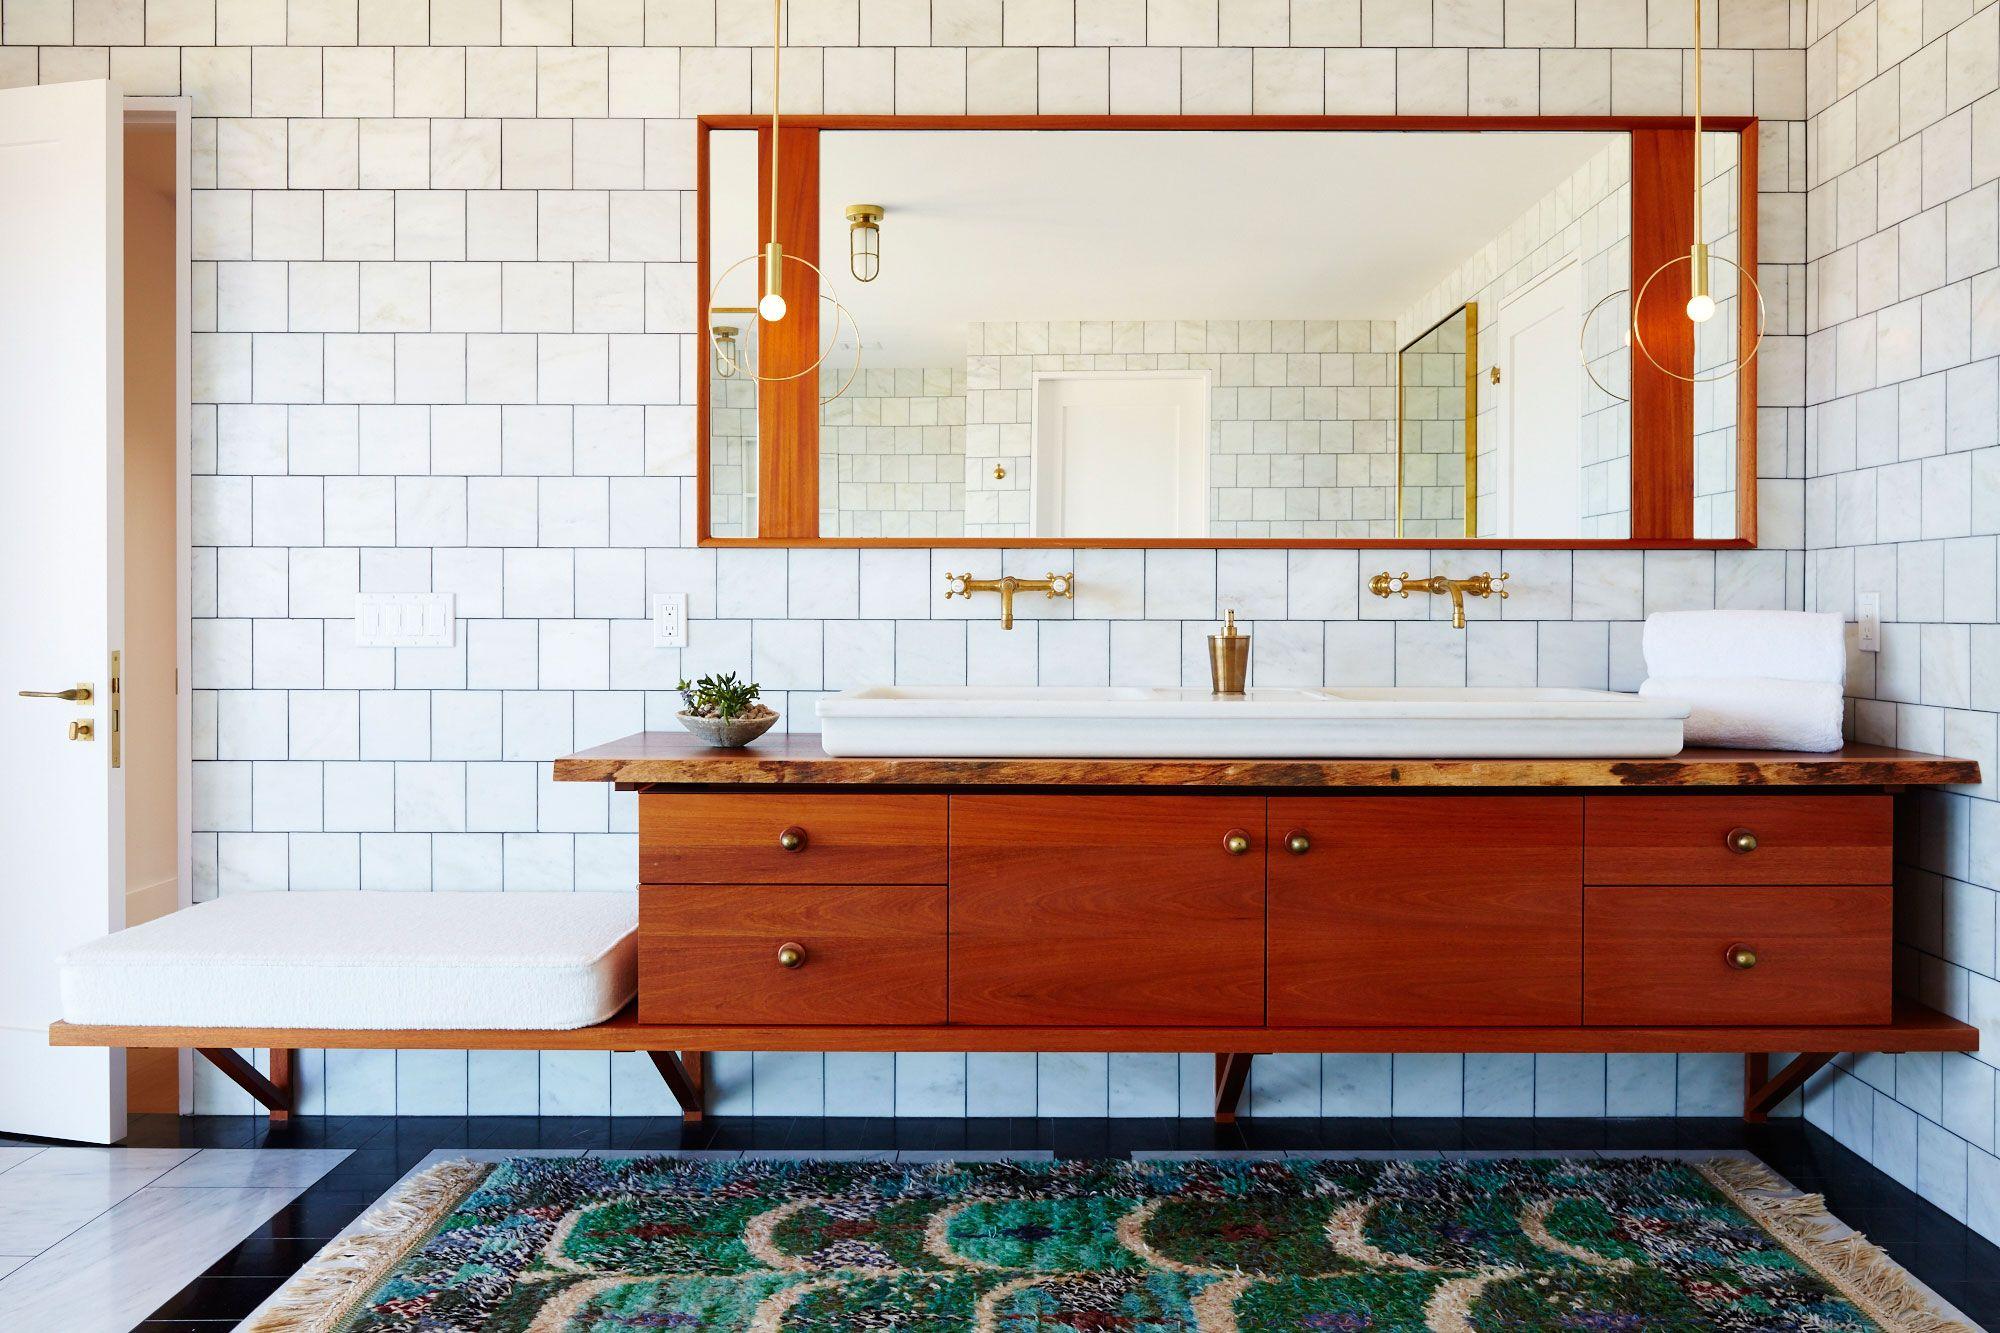 60 best bathroom designs photos of beautiful bathroom ideas to try rh housebeautiful com bedroom interiors ideas bedroom interior ideas 2018